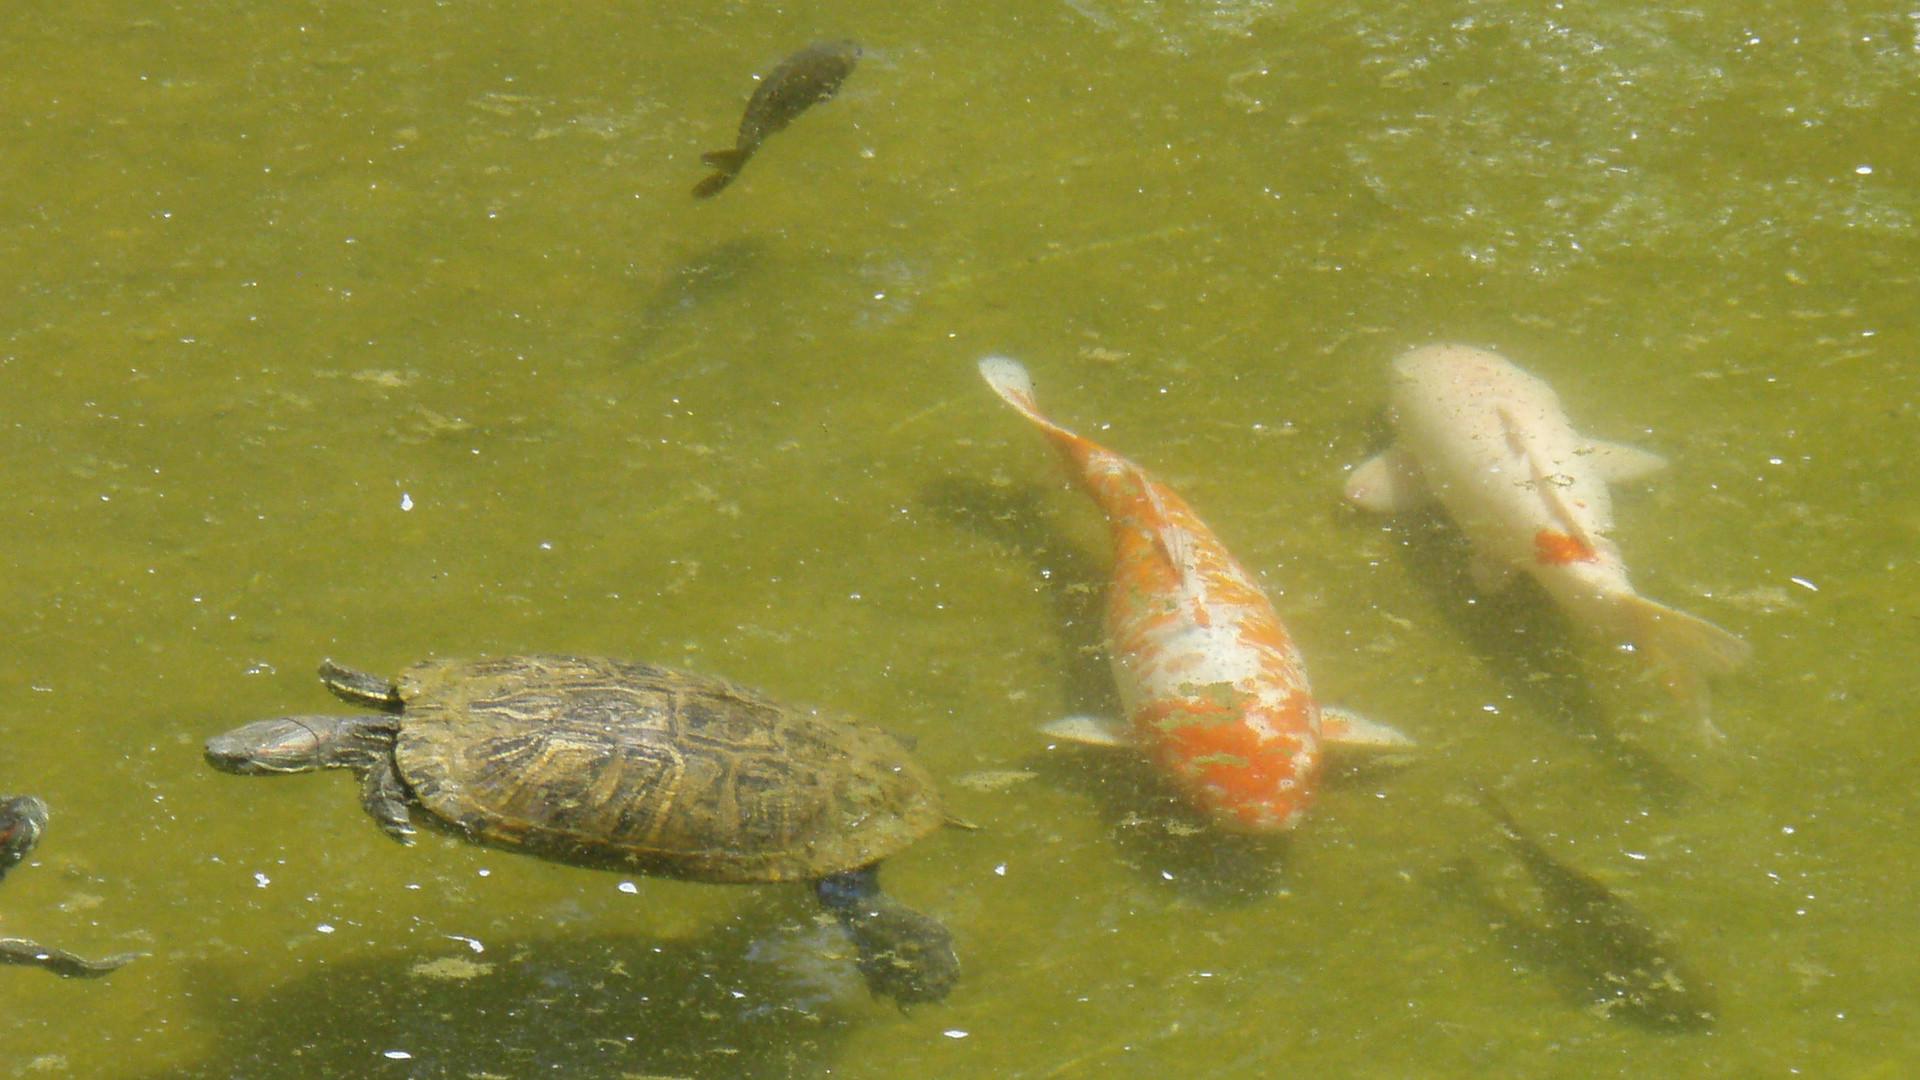 File Turtle and koi Wikimedia mons